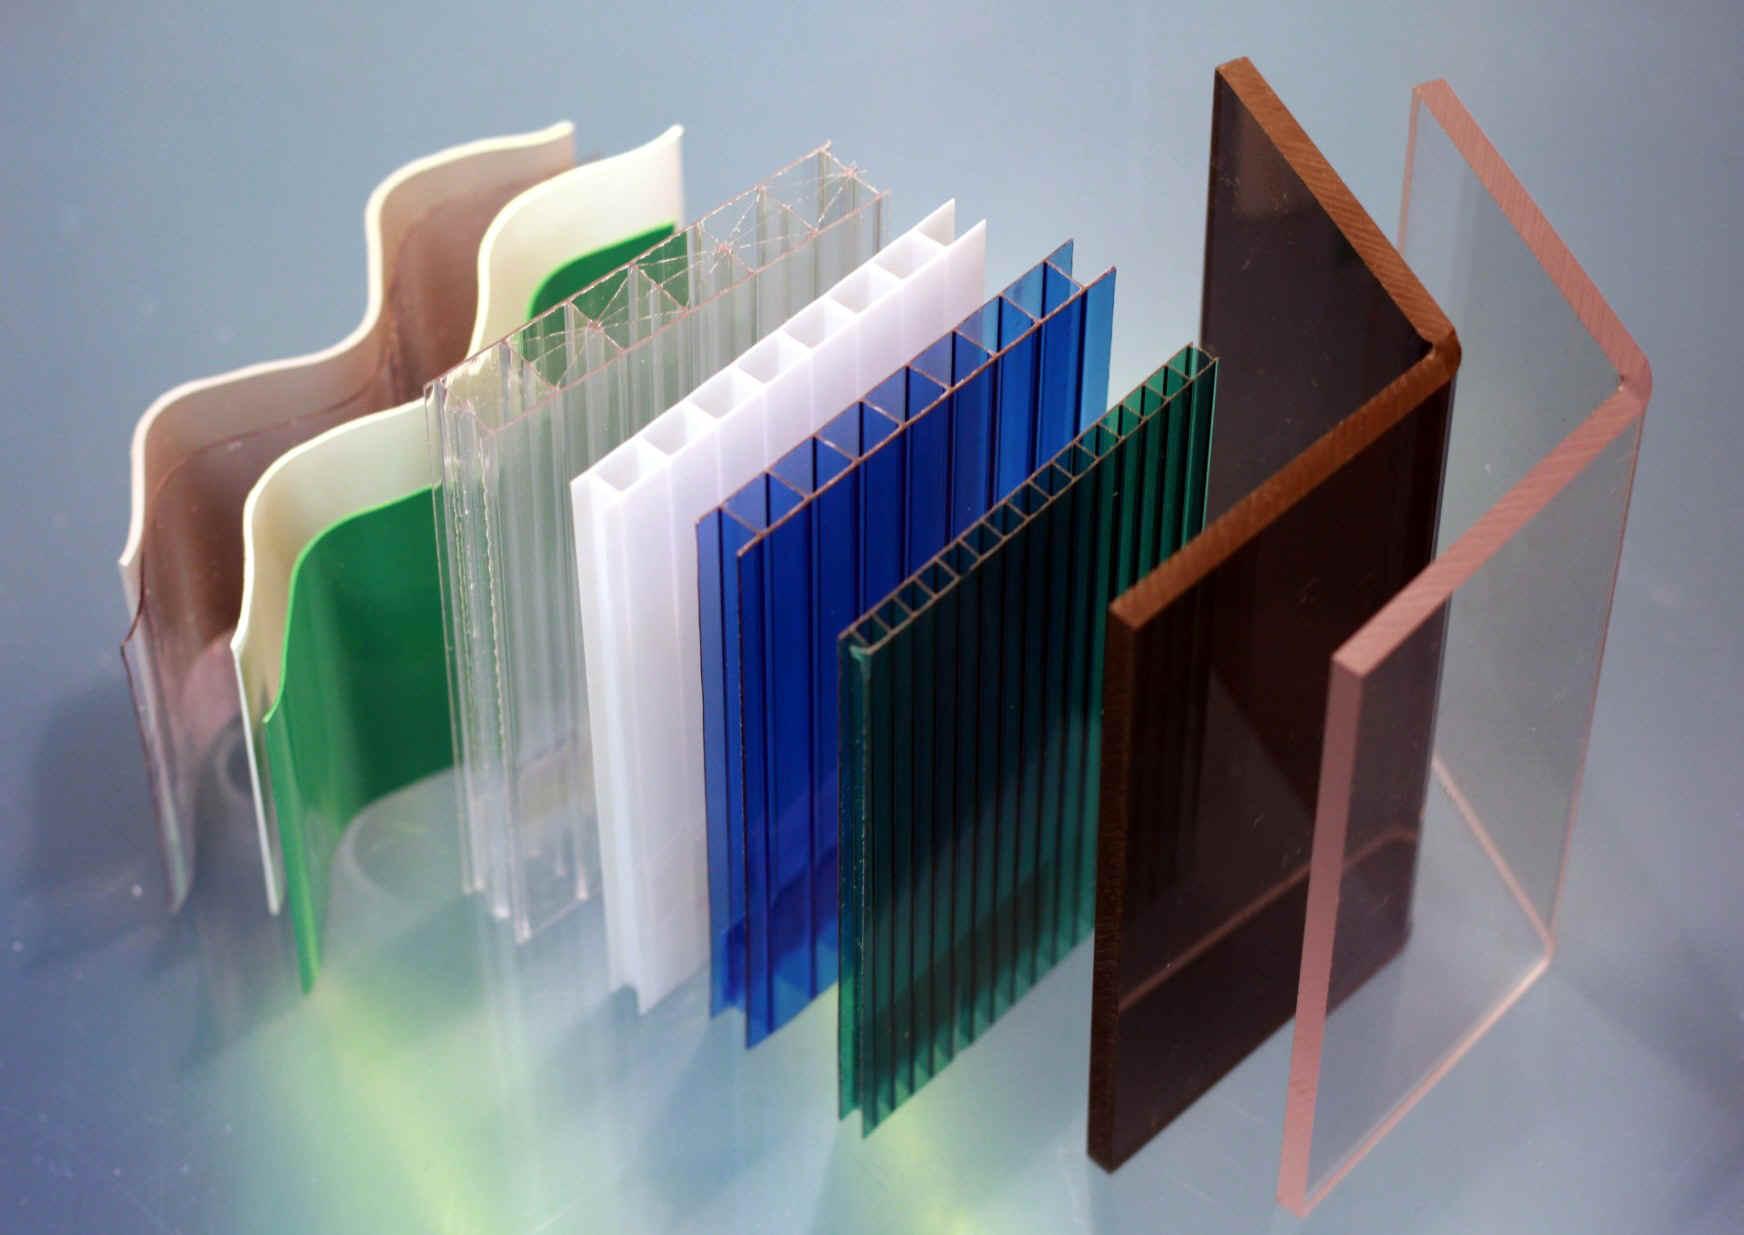 建築膠片 Architectural Plastic